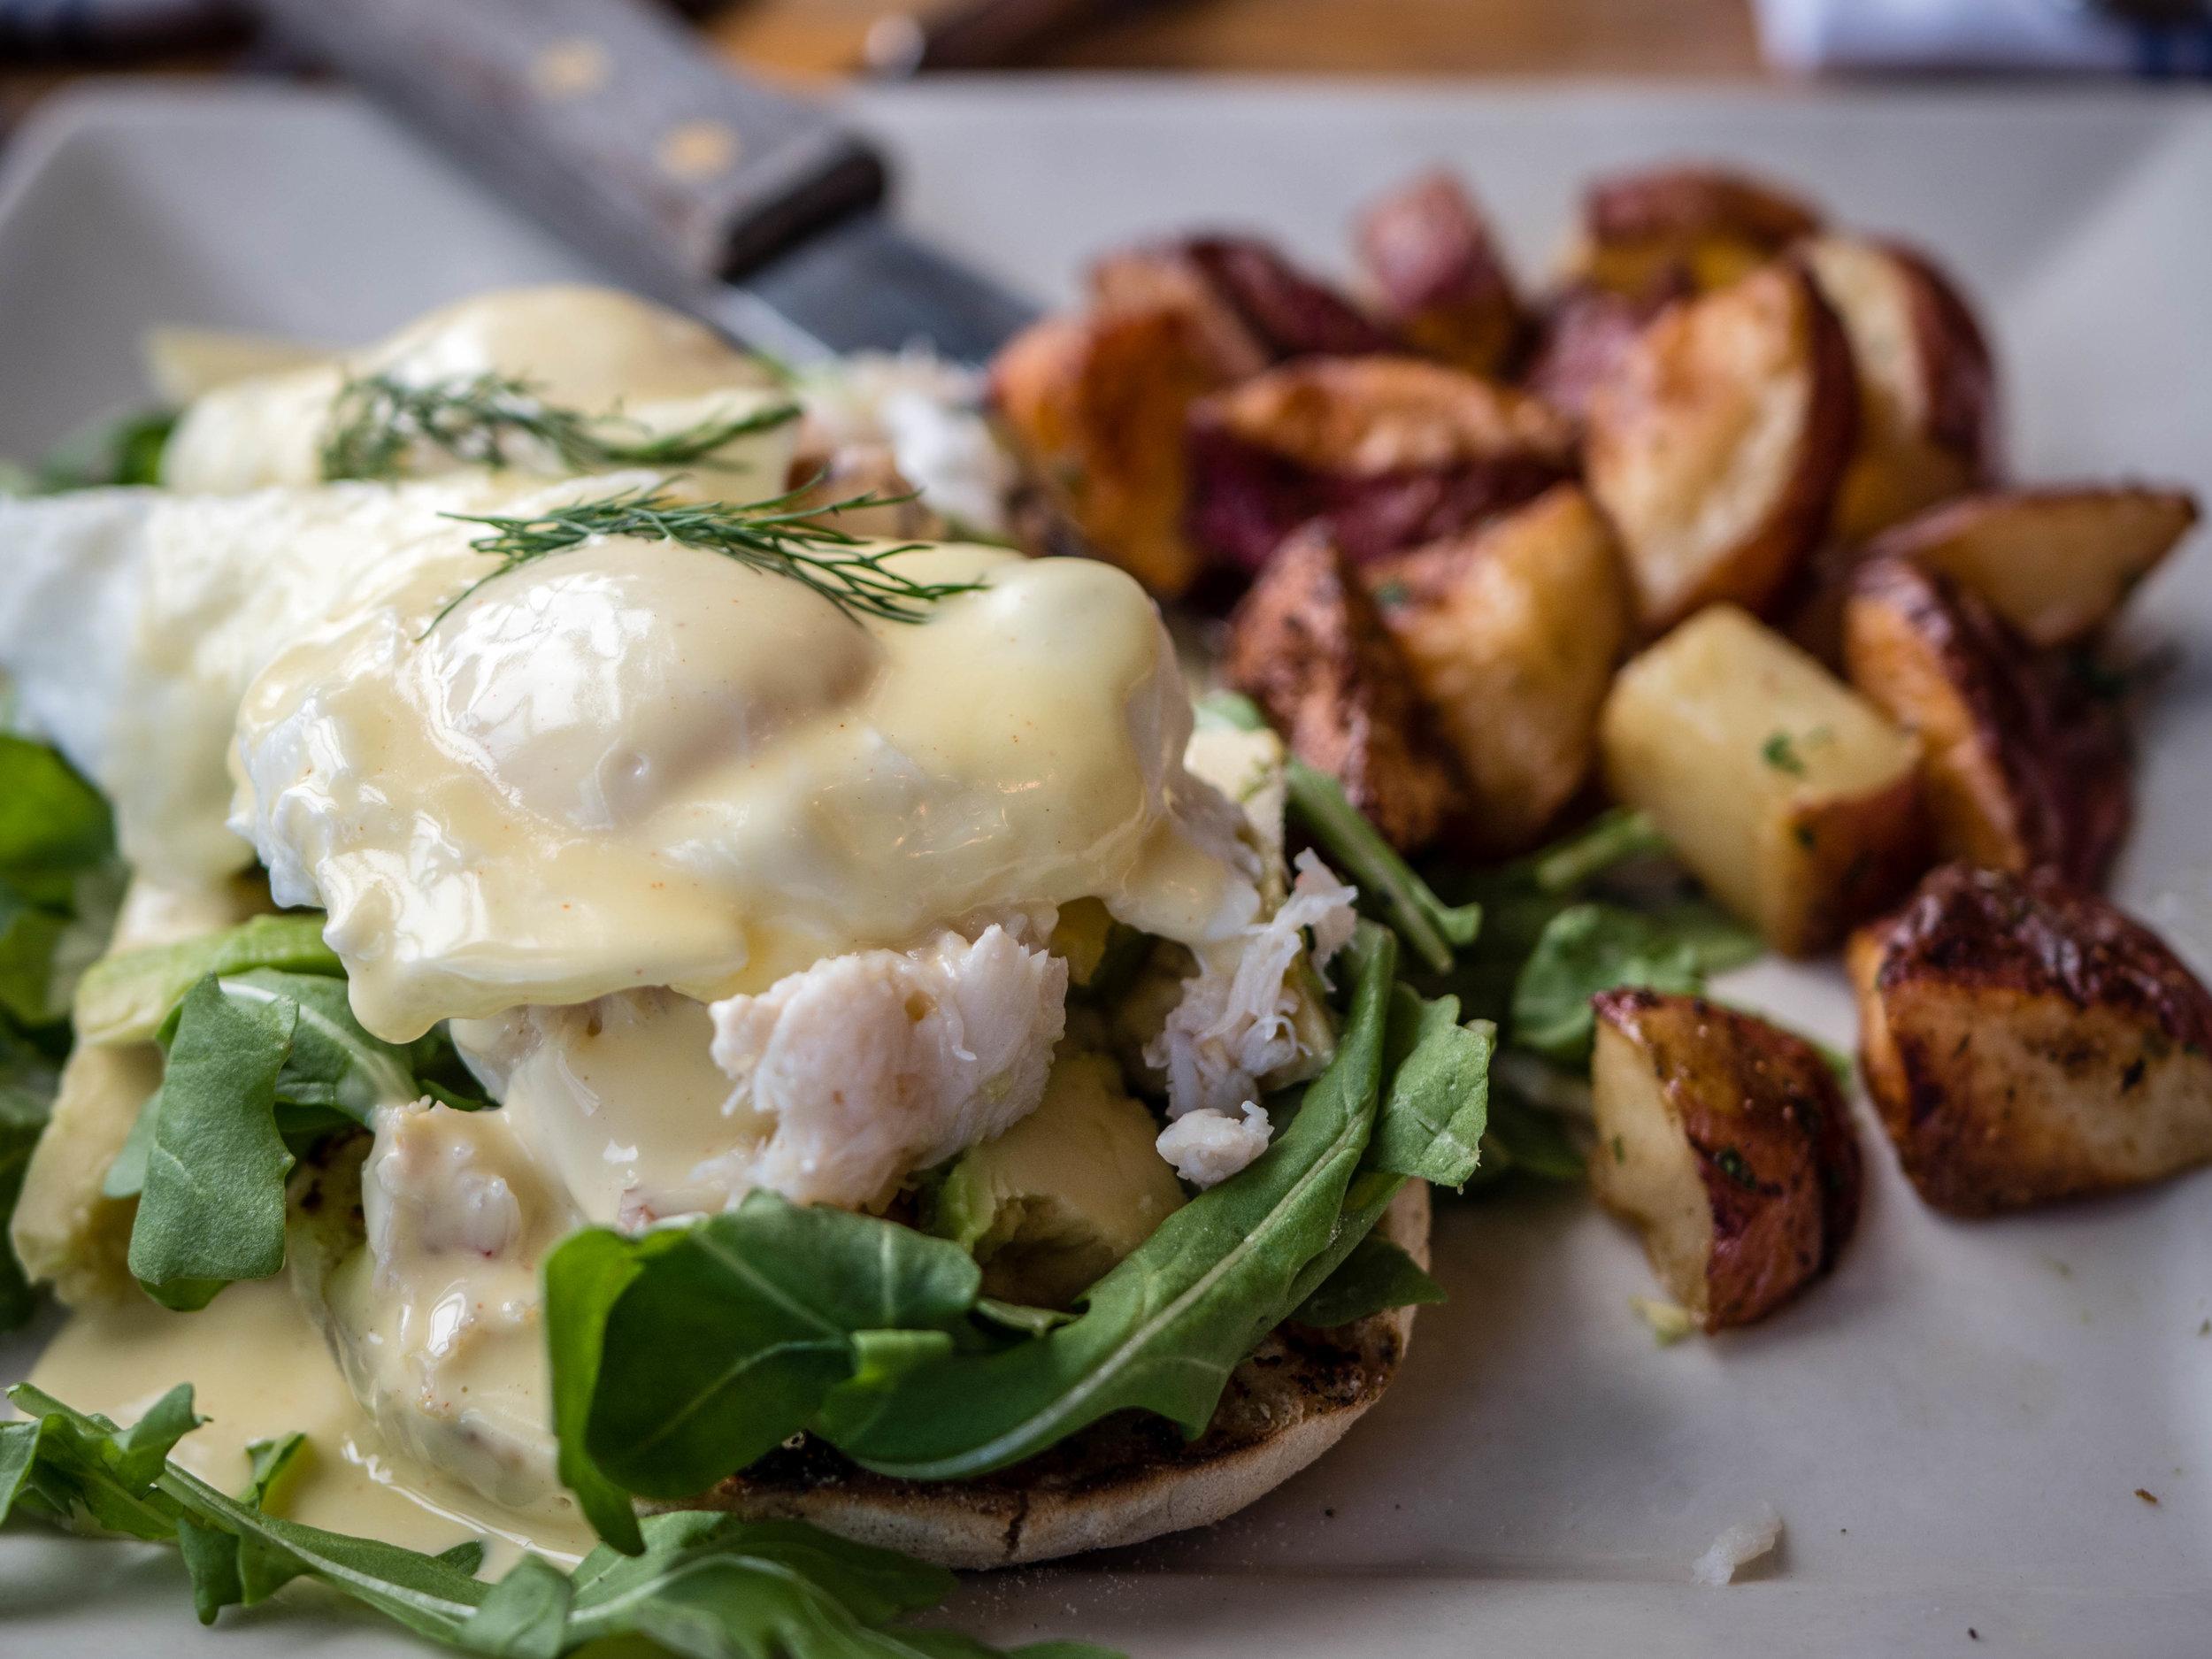 Excellent breakfast of dungeness crab eggs benedict and herbed potatoes